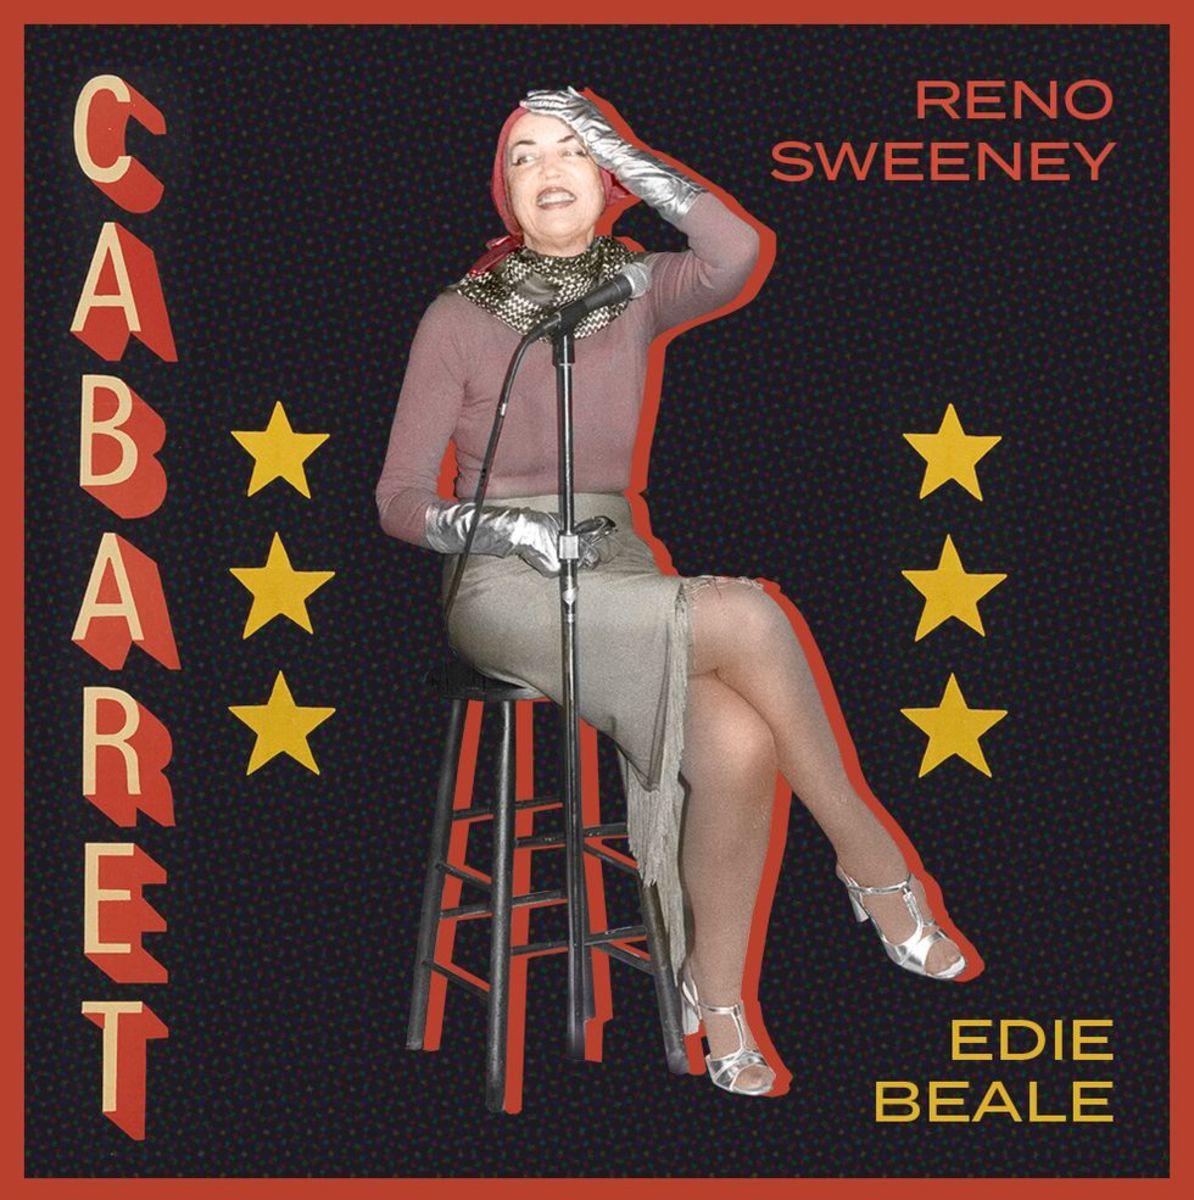 Edie Beale, Reno Sweeney Cabaret